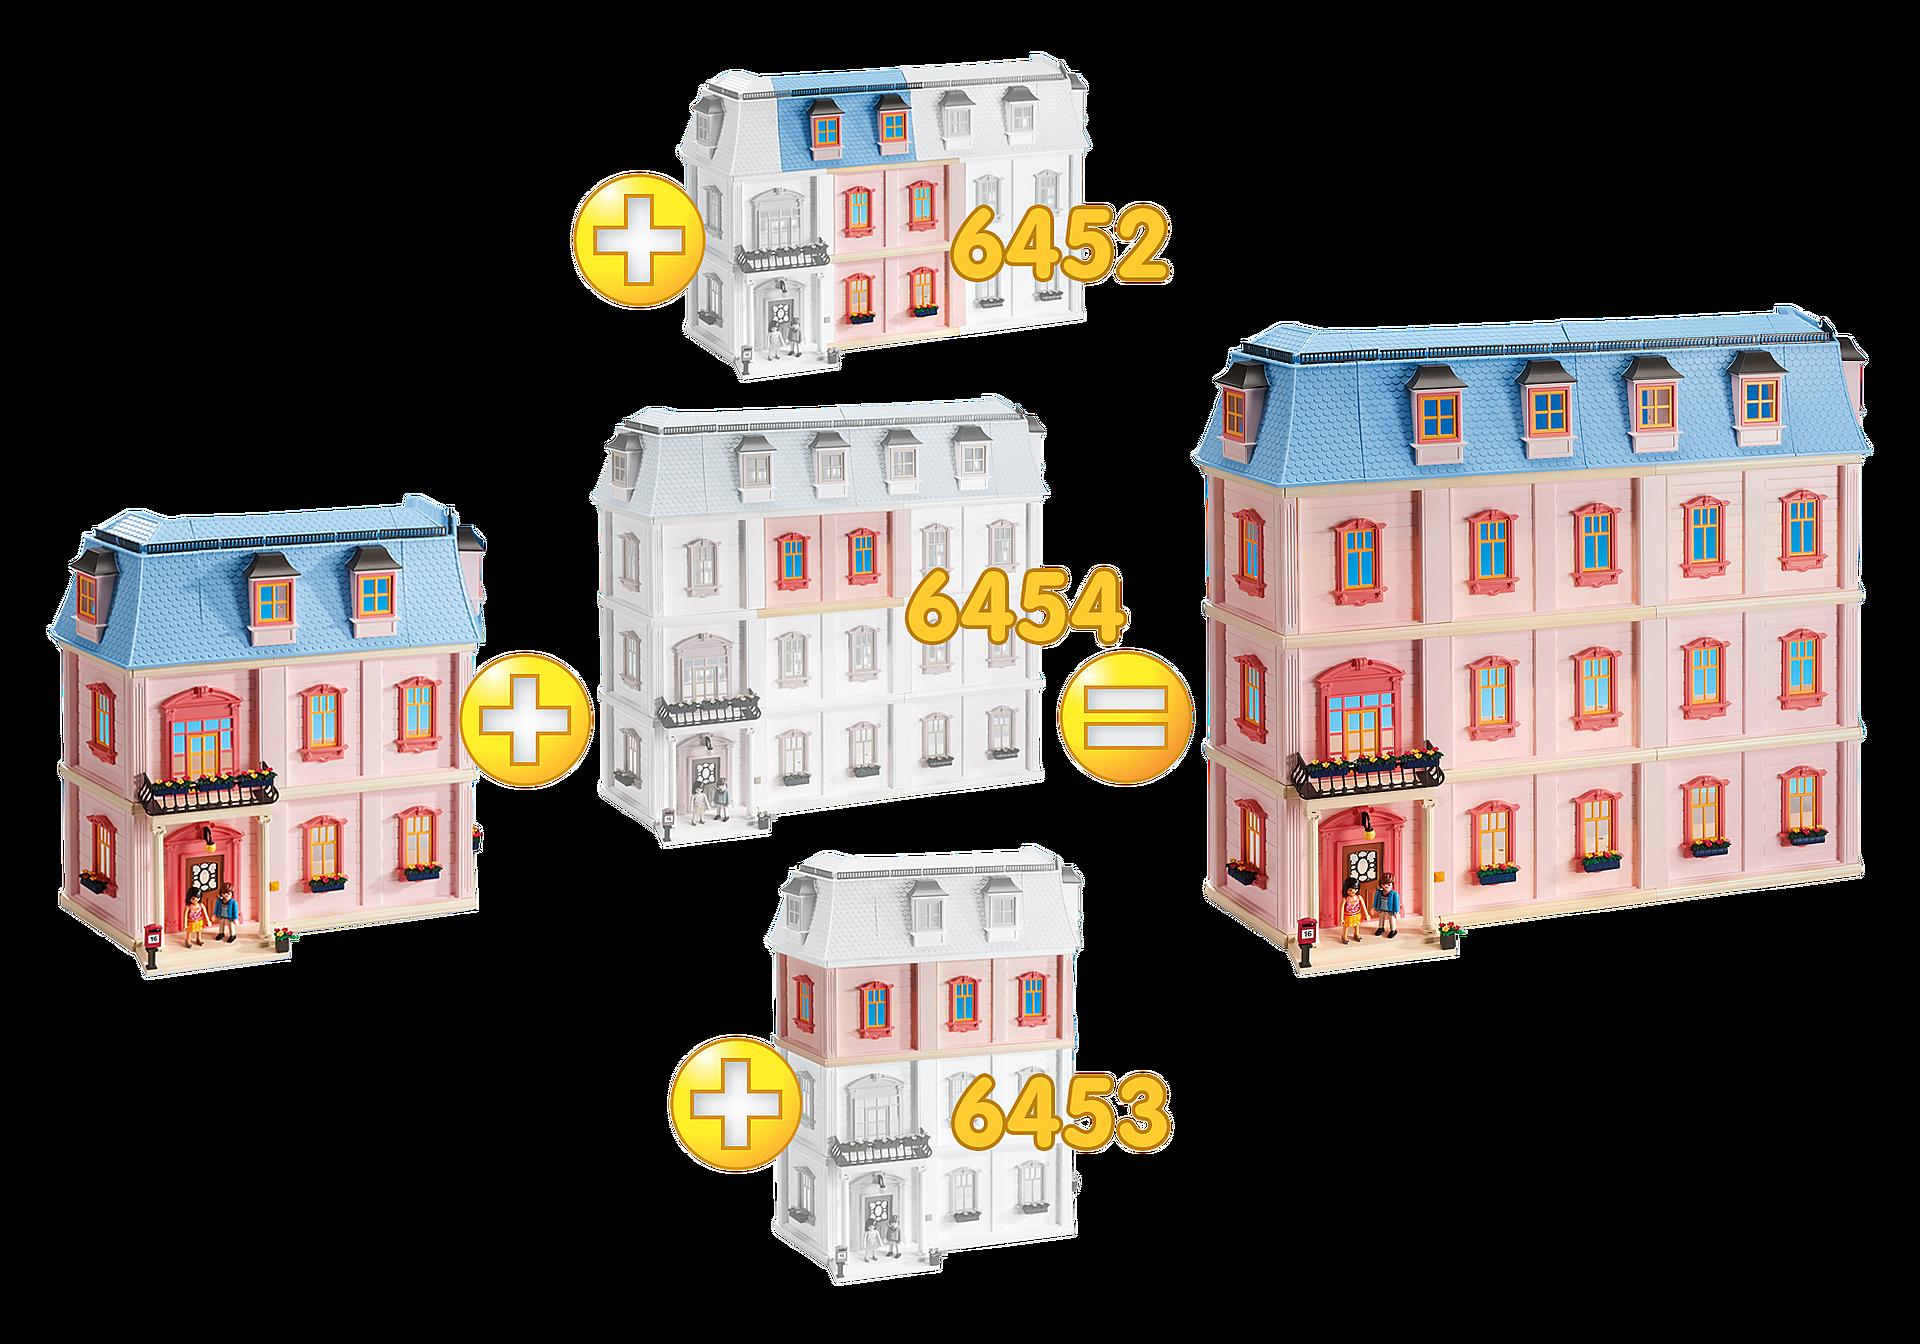 http://media.playmobil.com/i/playmobil/6454_product_extra1/Pièce supplémentaire pour maison traditionnelle (Réf. 5303)